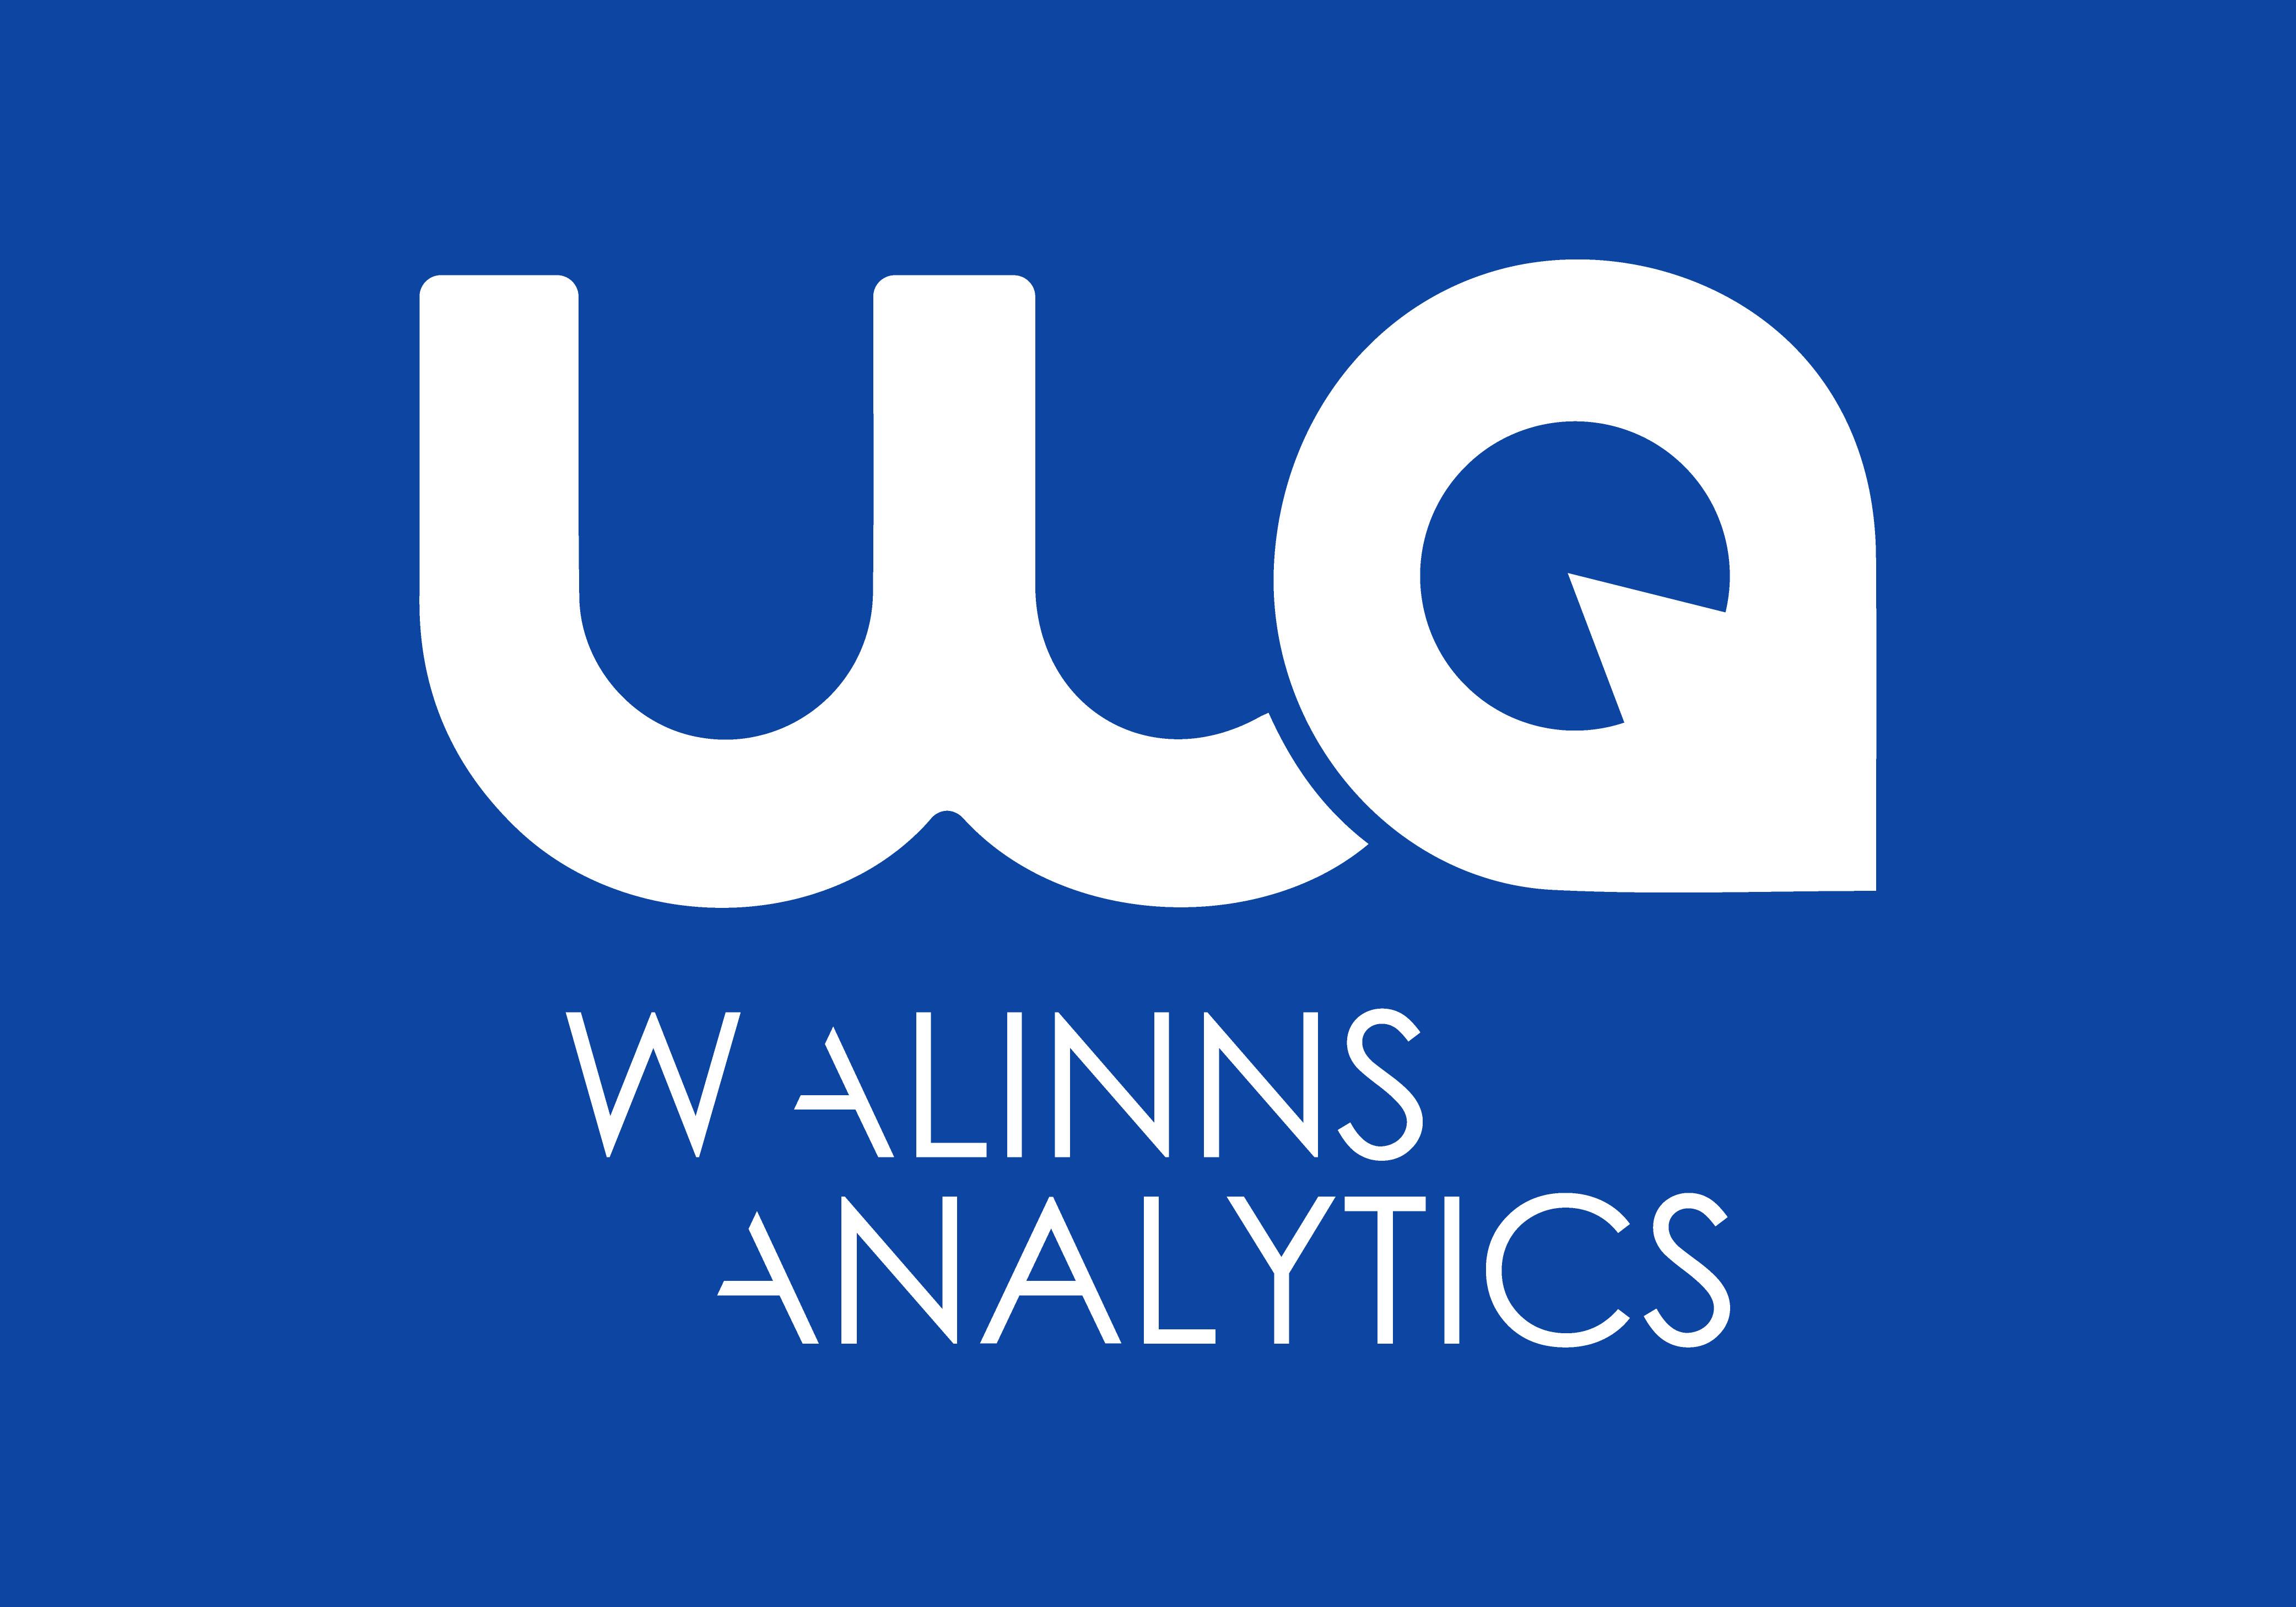 Walinns Image